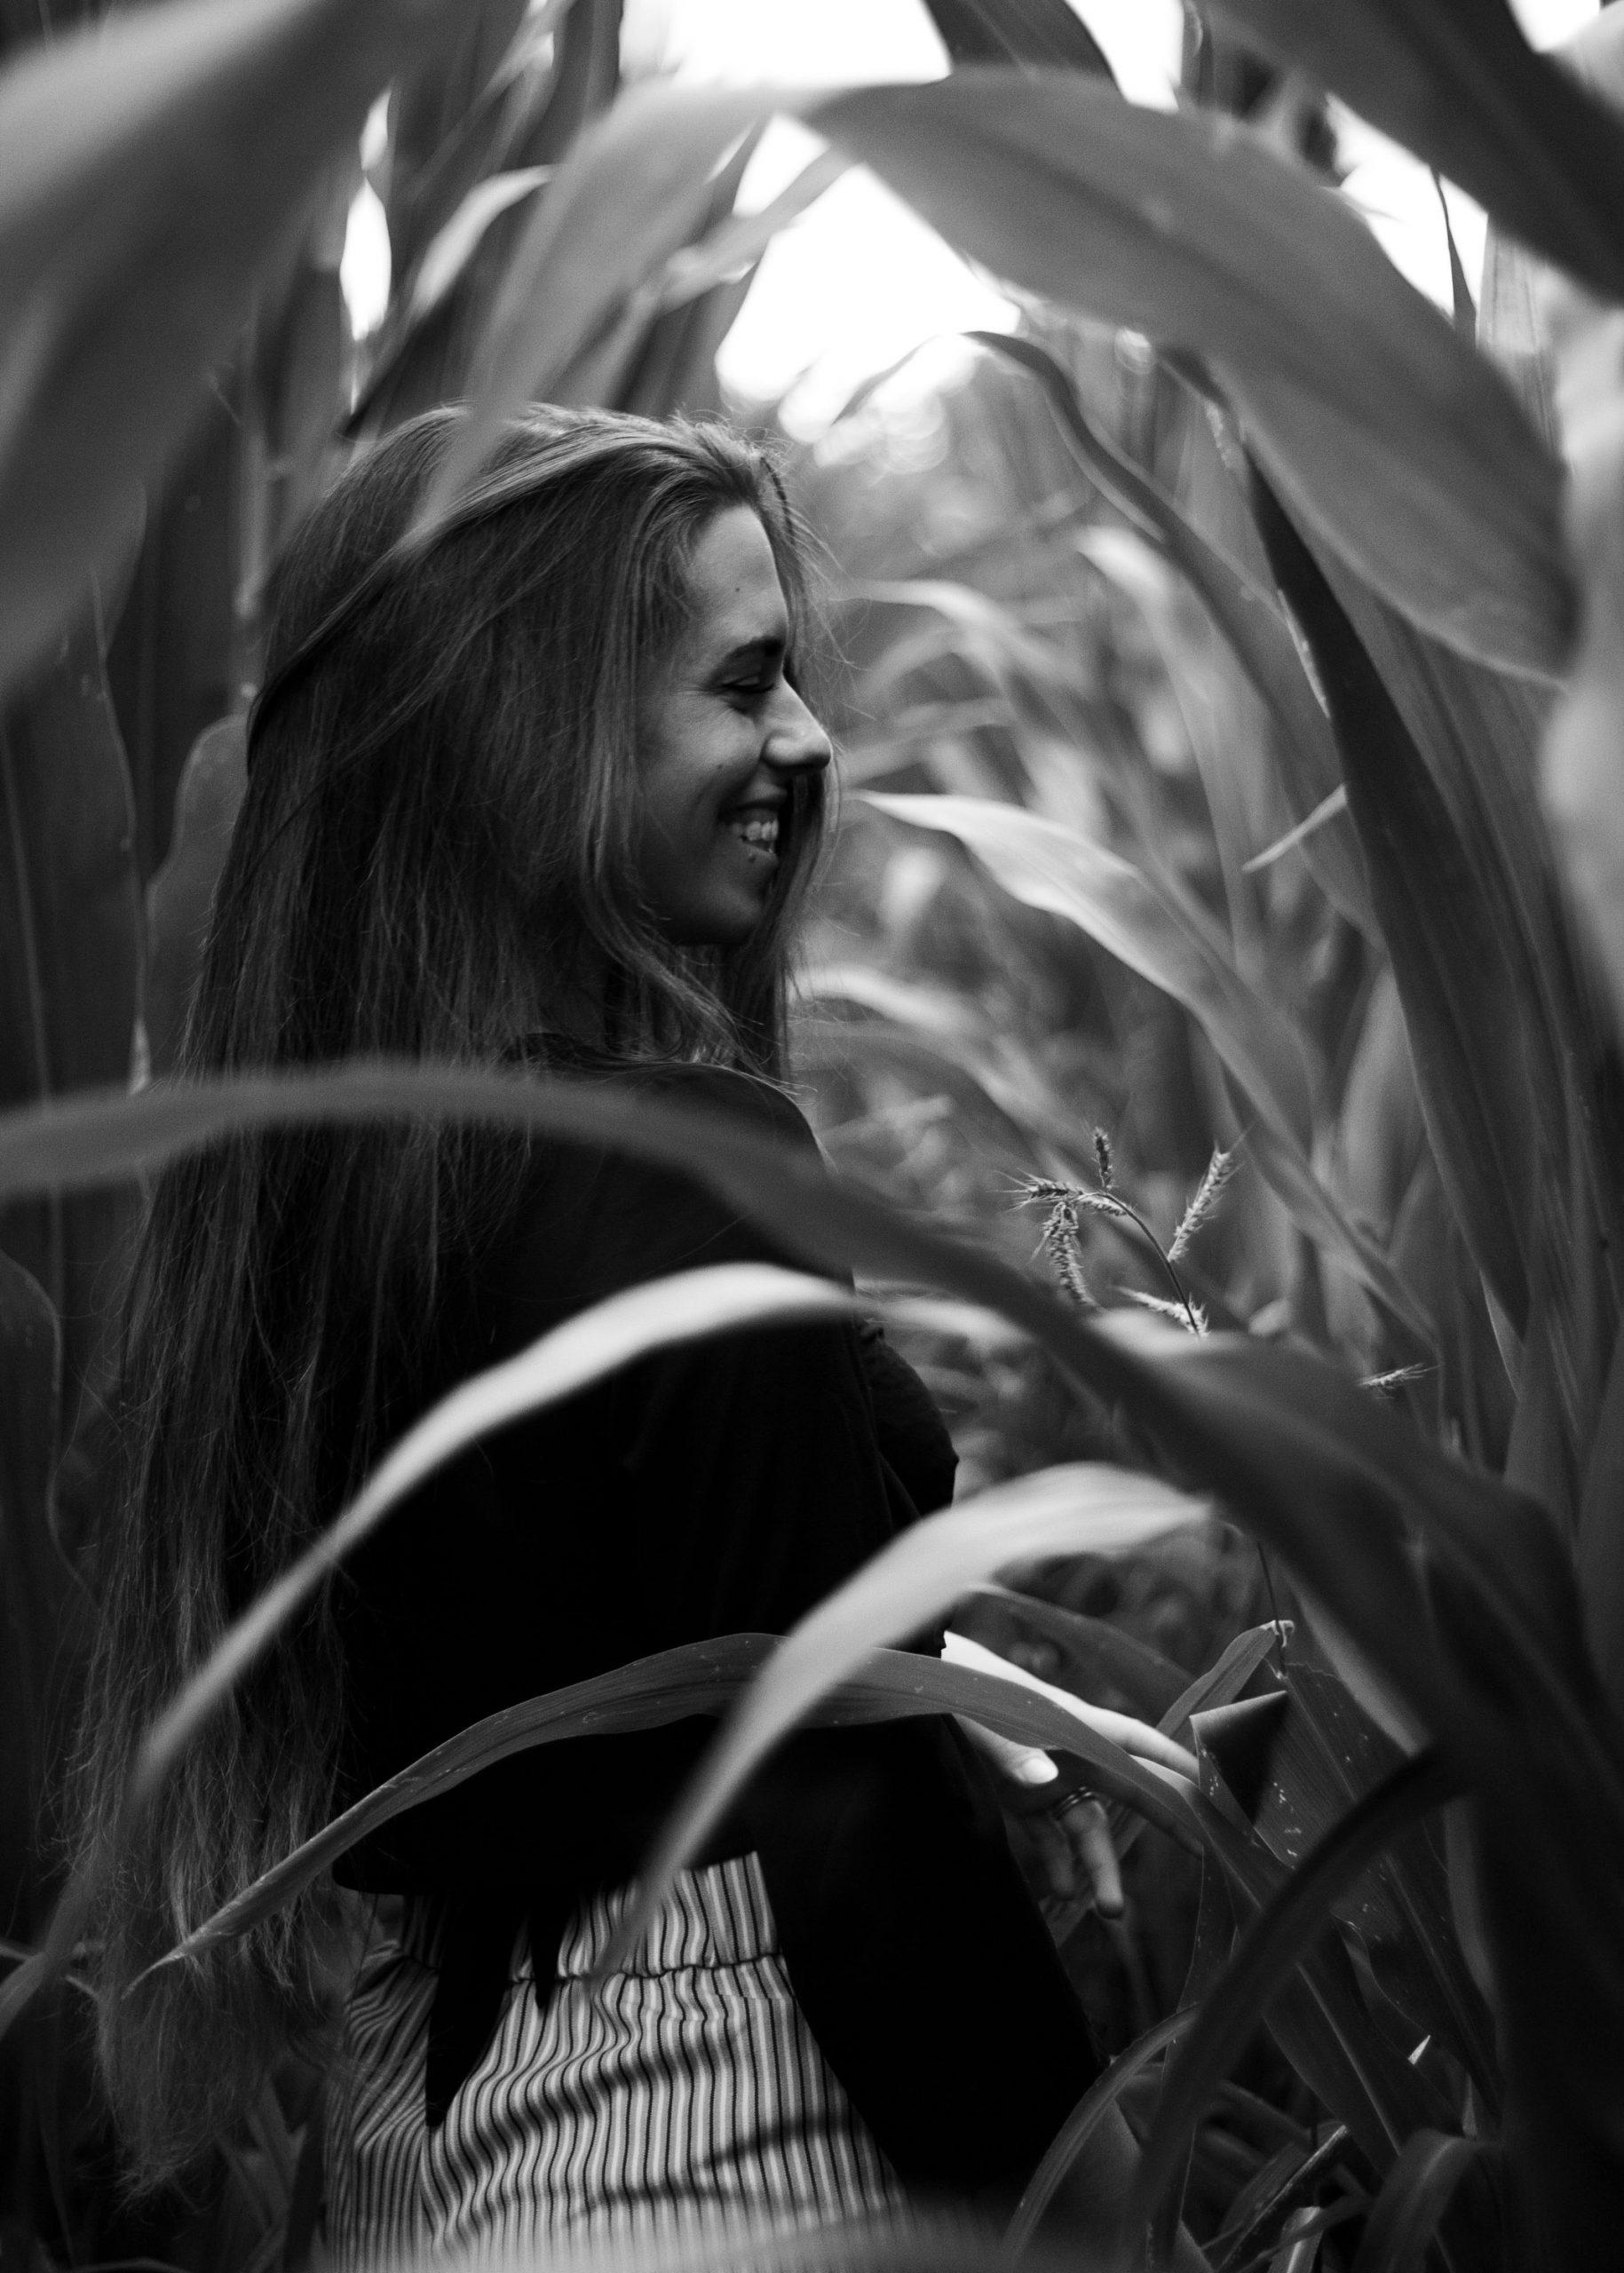 Categoria: Portrait; Photographer & Model: FRANCESCA CASARO; Location: Padova, PD, Italia